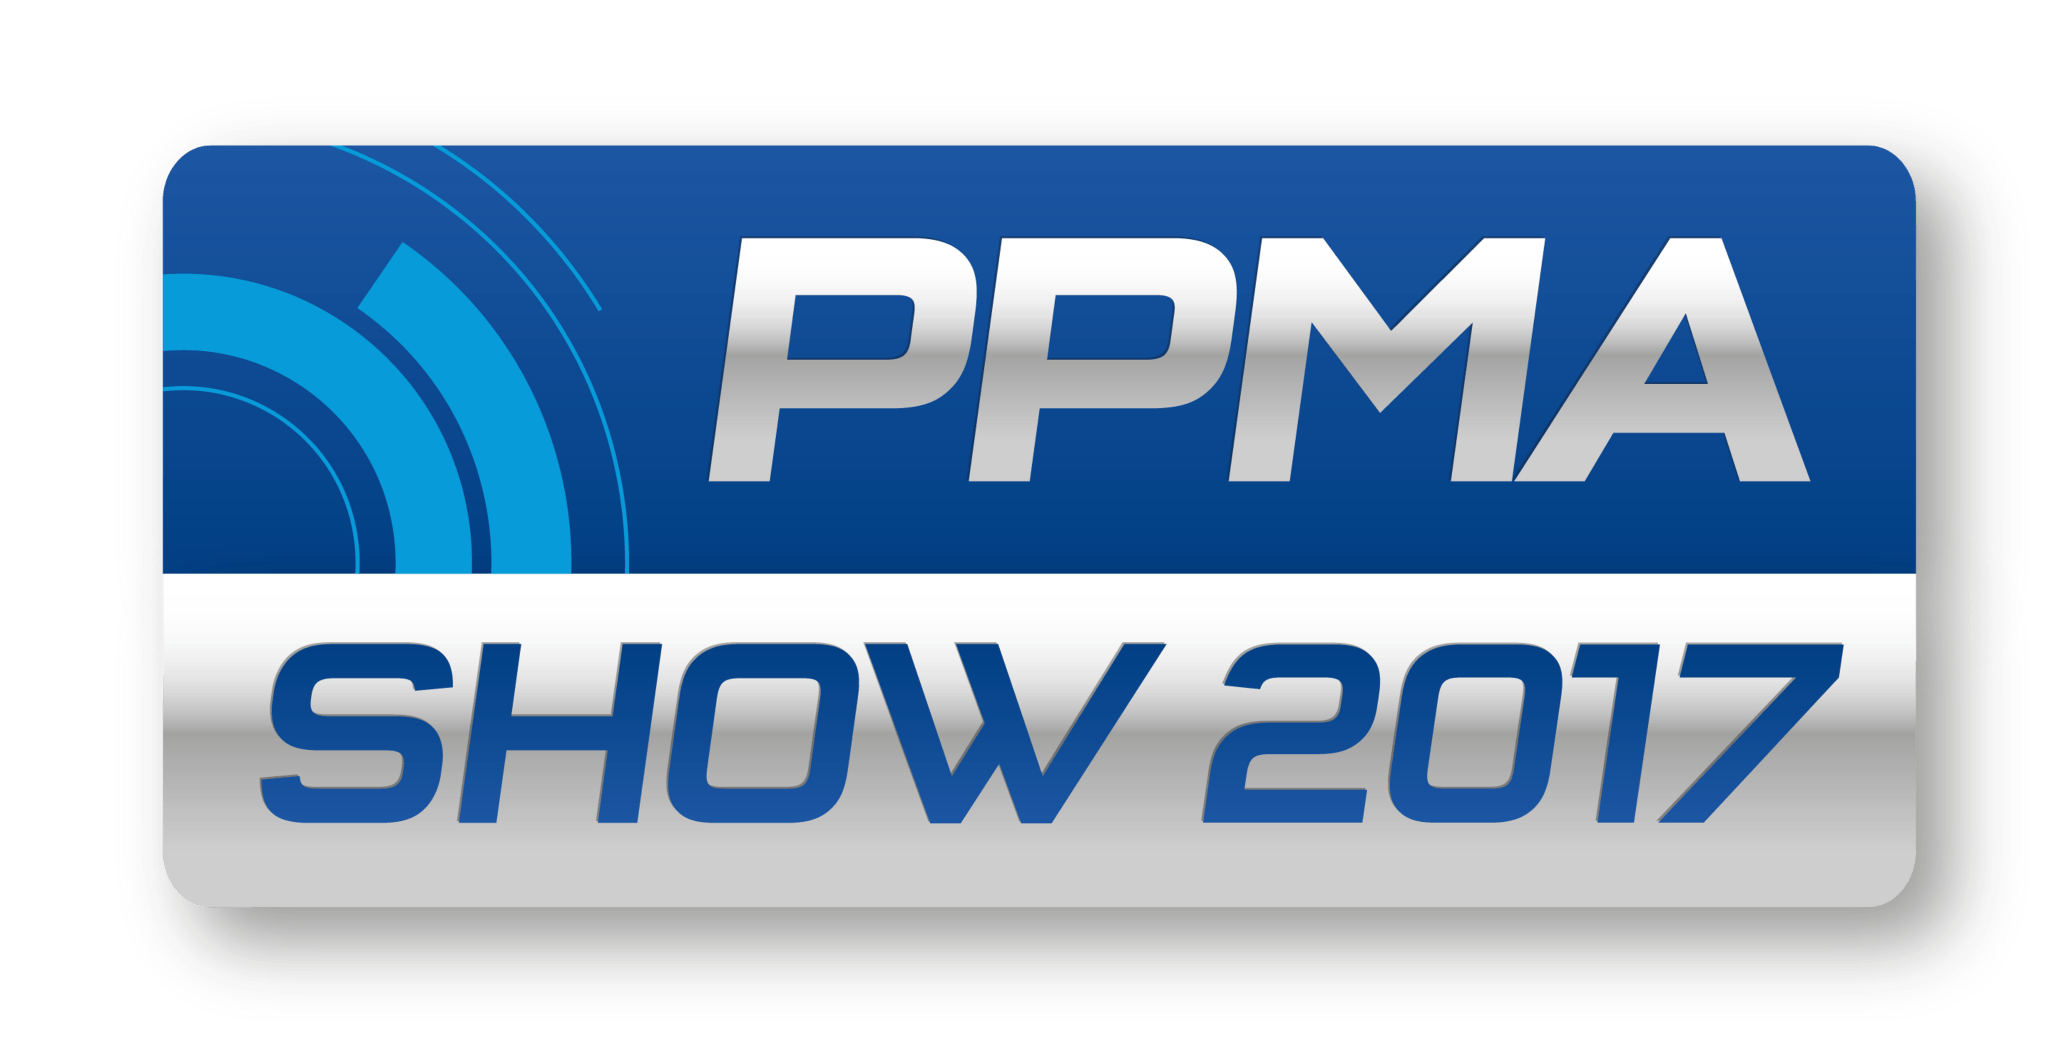 PPMA-show17-logo-badge